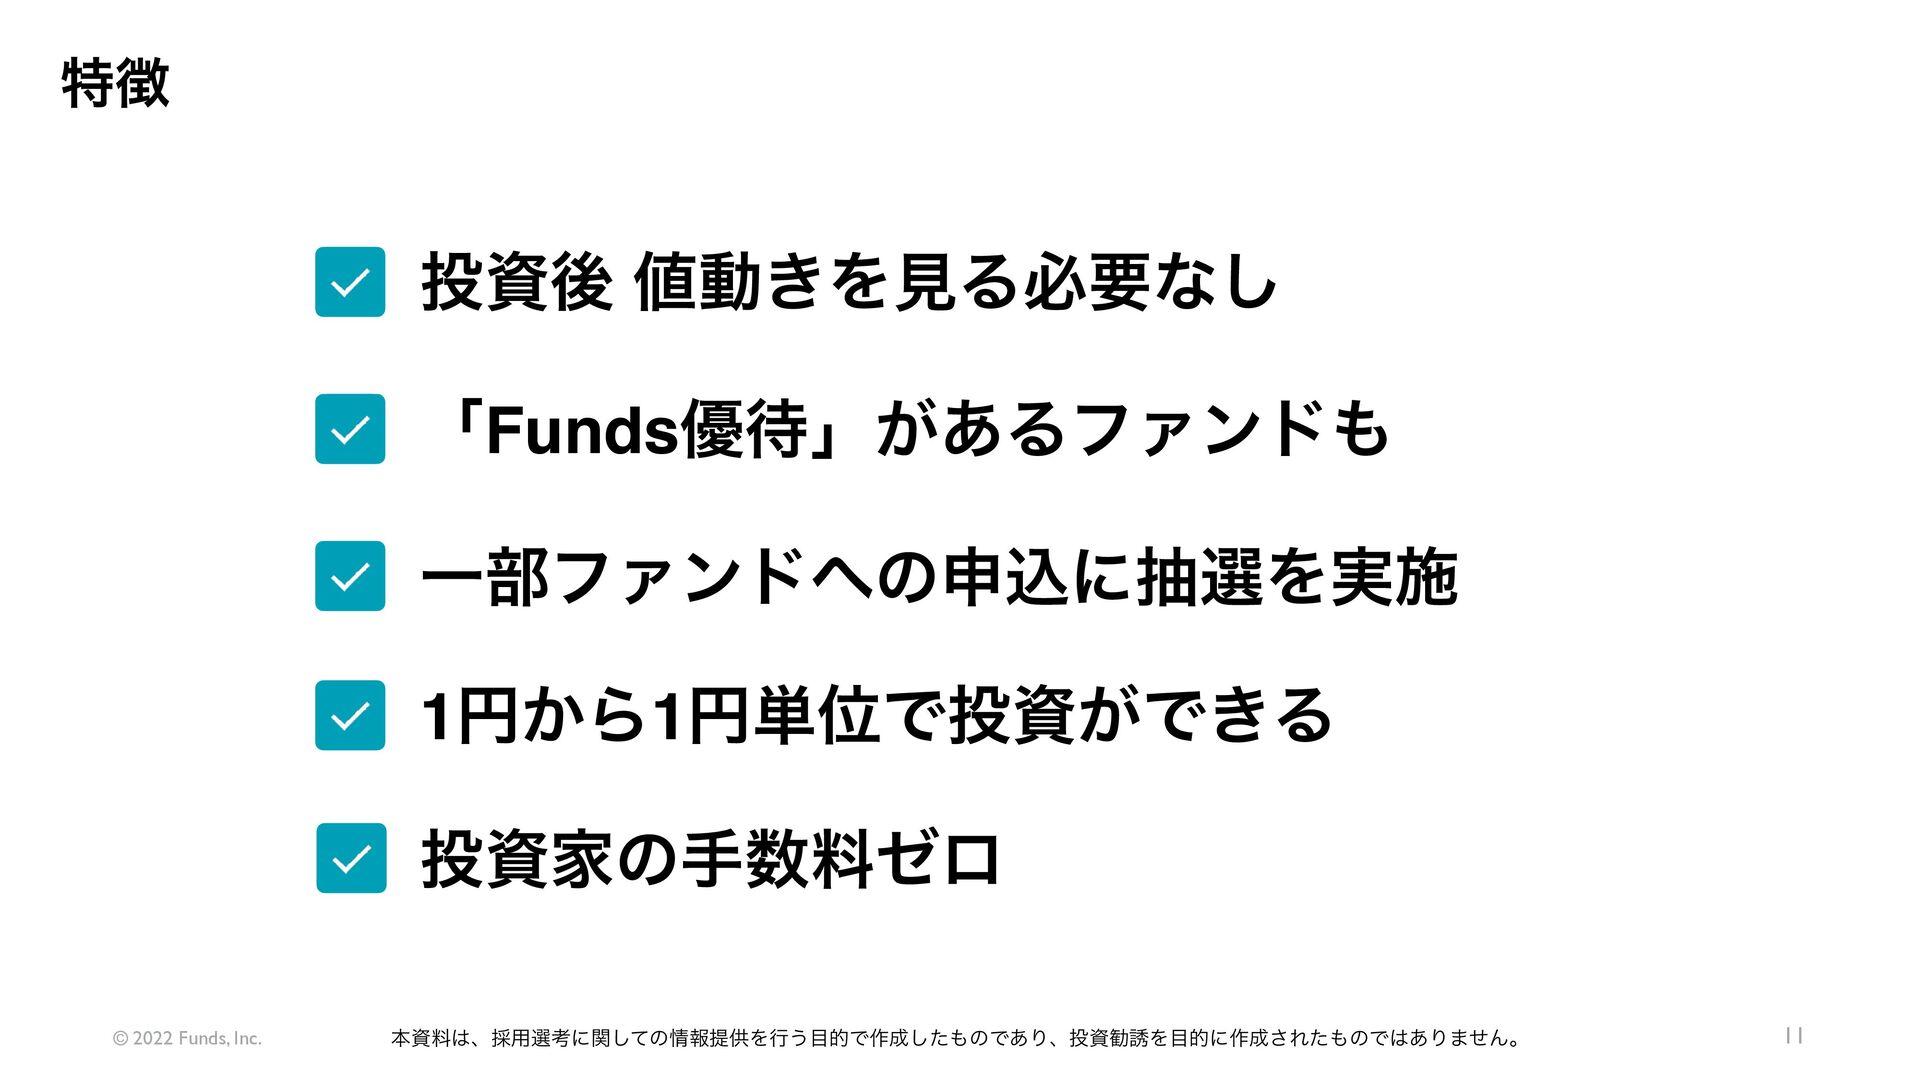 © 2021 Funds, Inc. ಛ 11 ʮFunds༏ʯ͕͋ΔϑΝϯυ ޙ ...